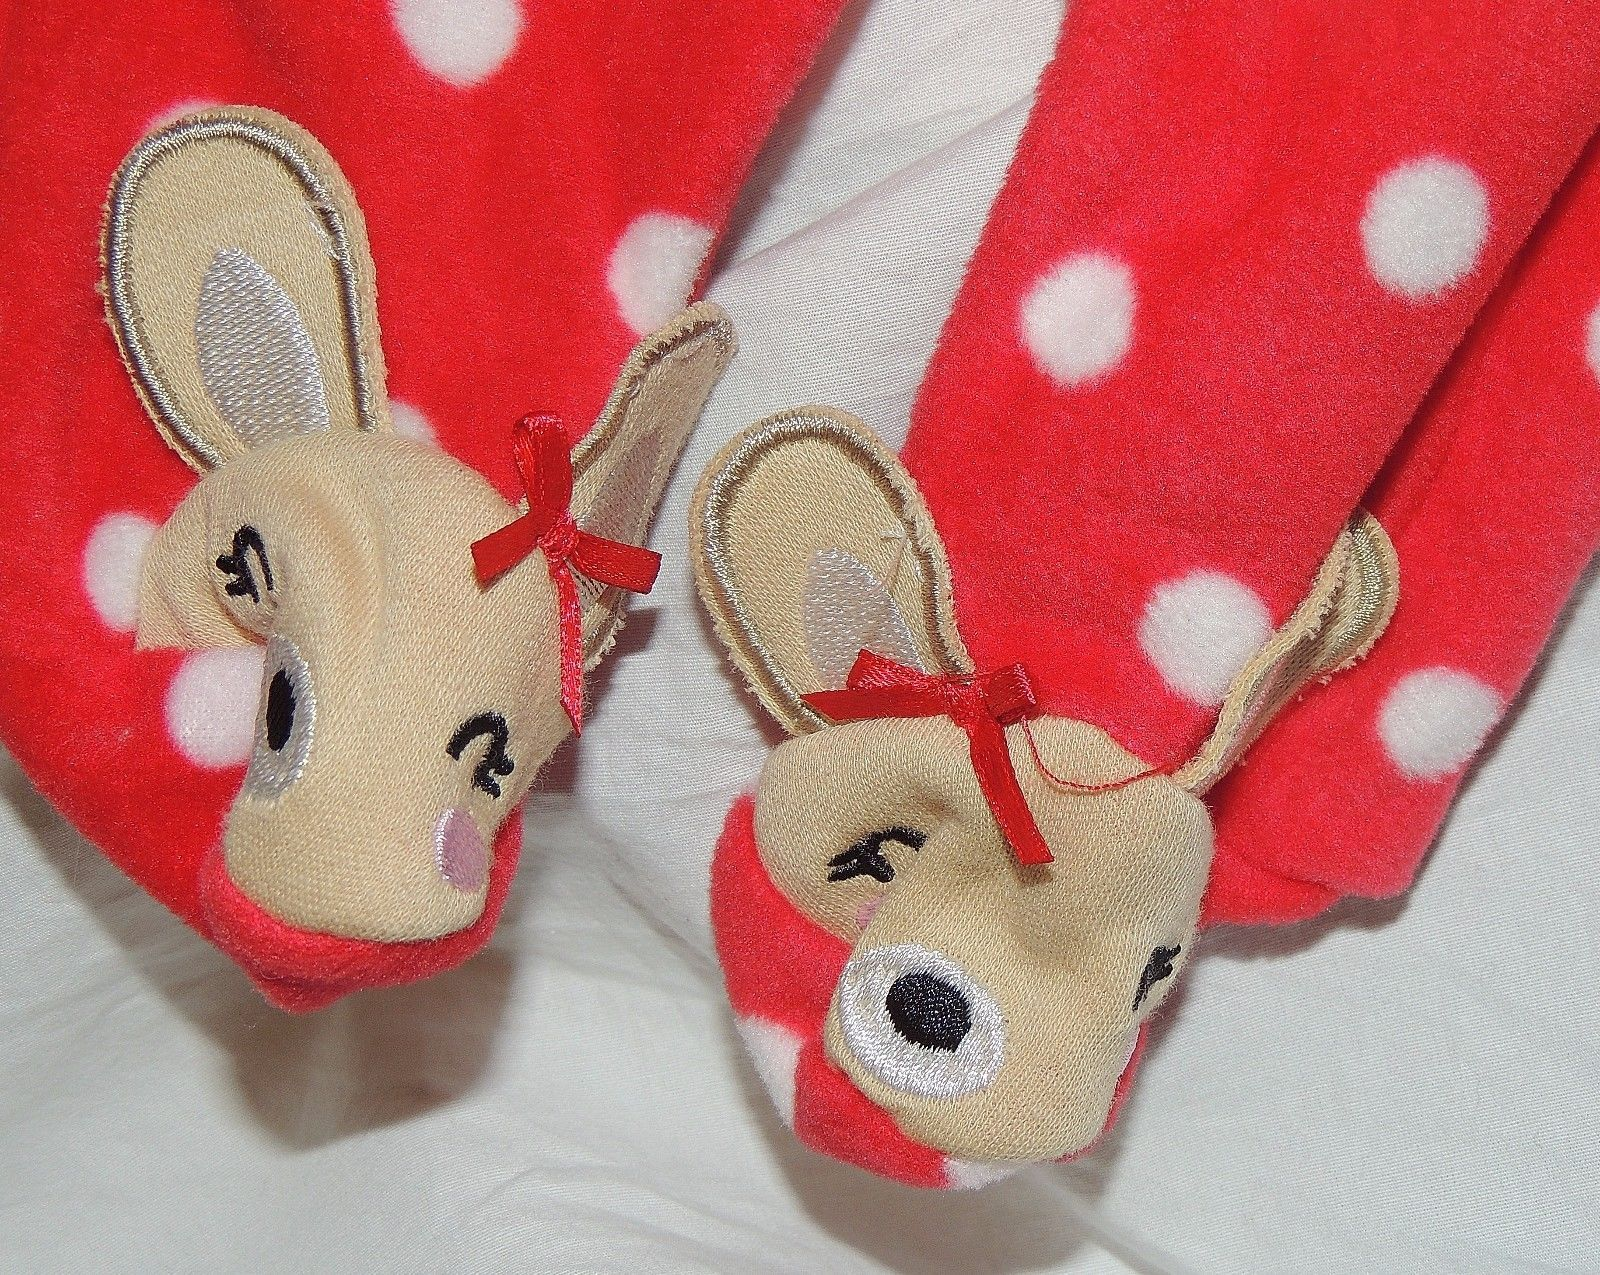 1ee0e7f76f New Baby Girl First Christmas Pajamas w Feet Newborn Reindeer Rudolph  Clarice